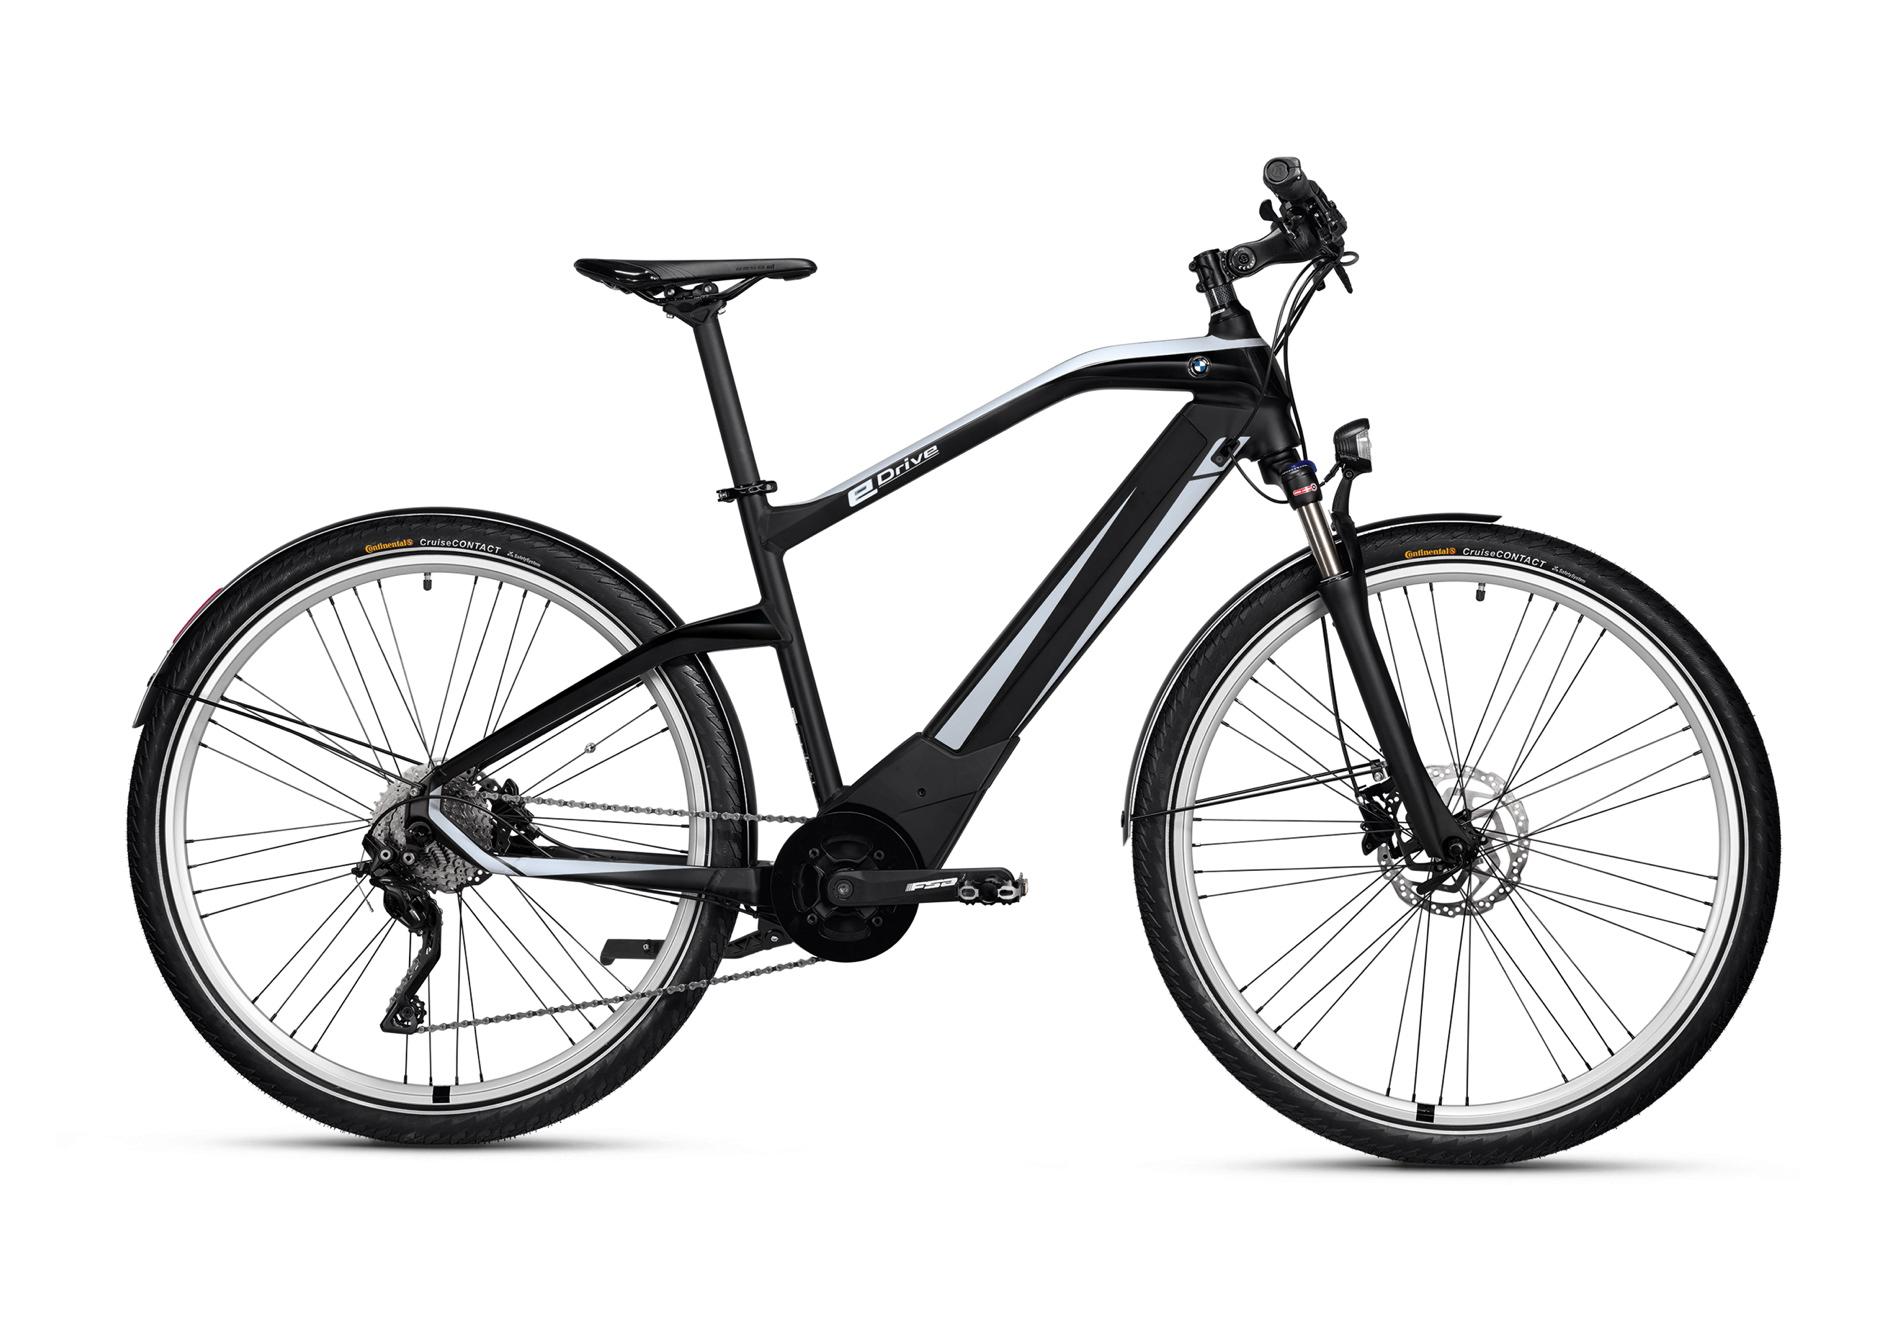 8. BMW Active Hybrid, E-Bike, 700C